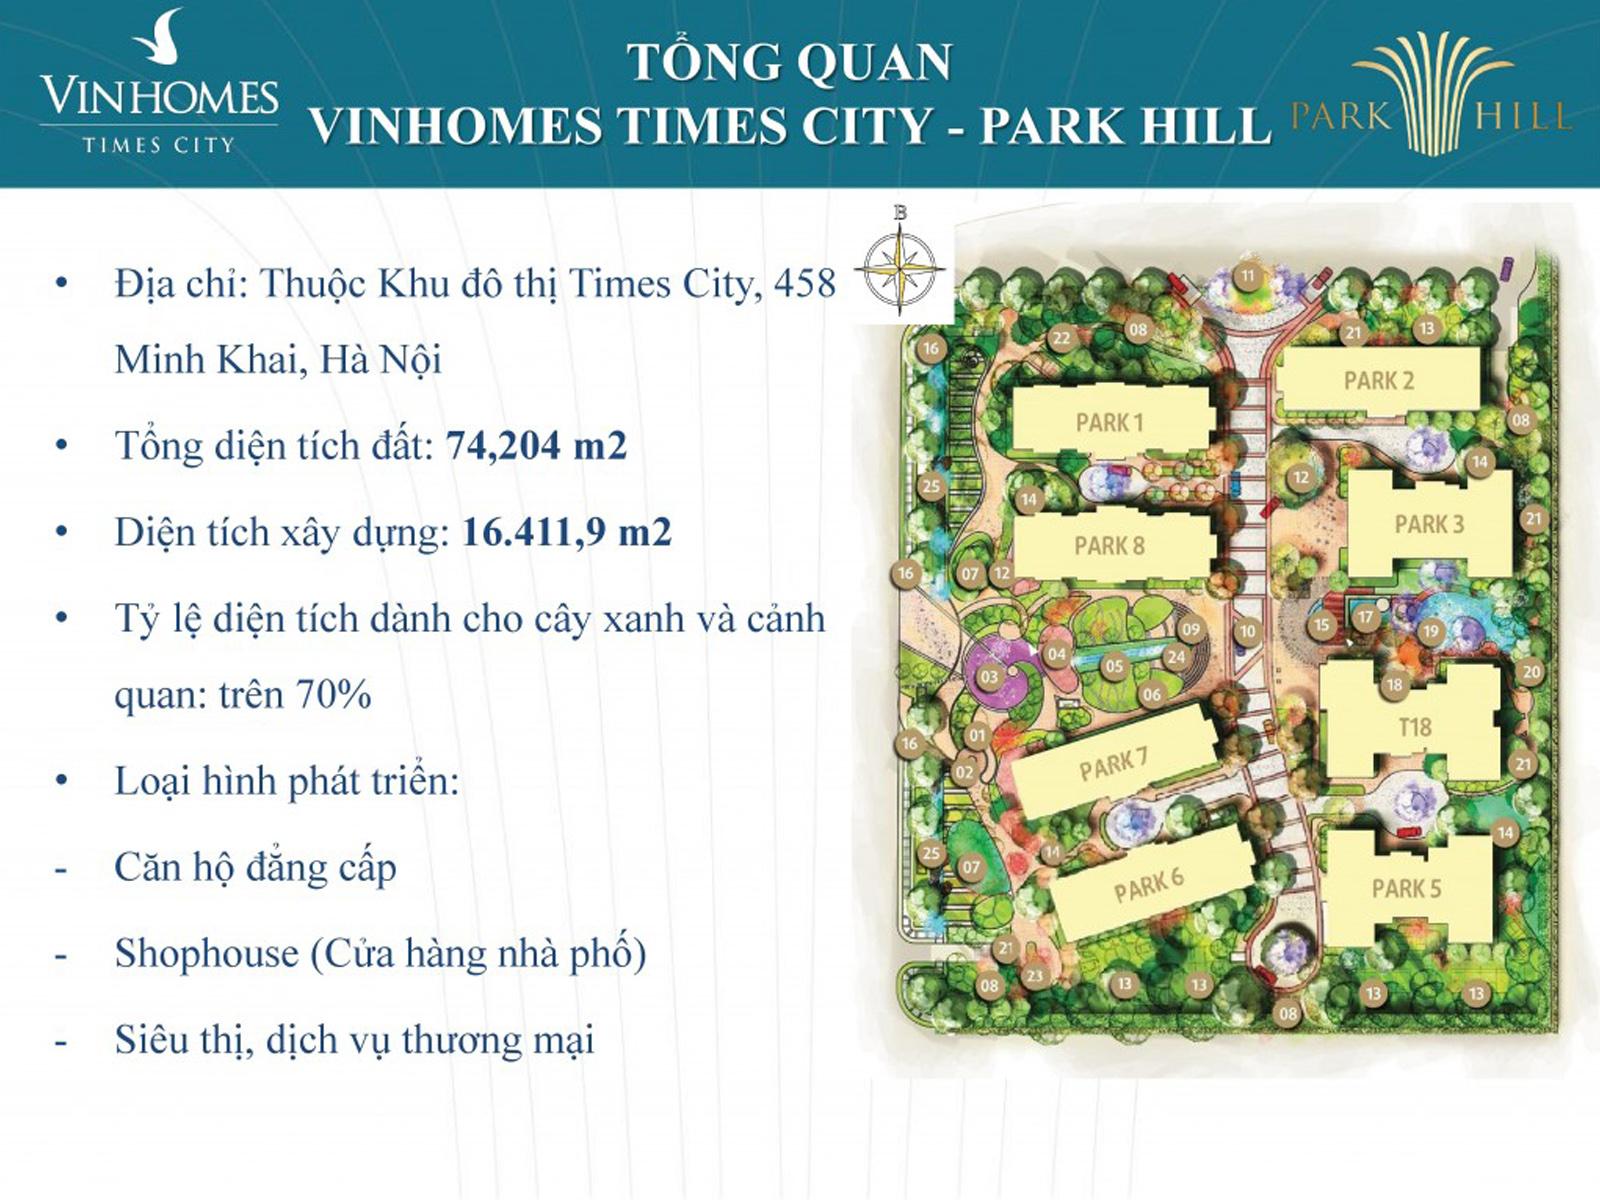 hinh anh tan huong nhip song thu thai tai park 3 times city so 1